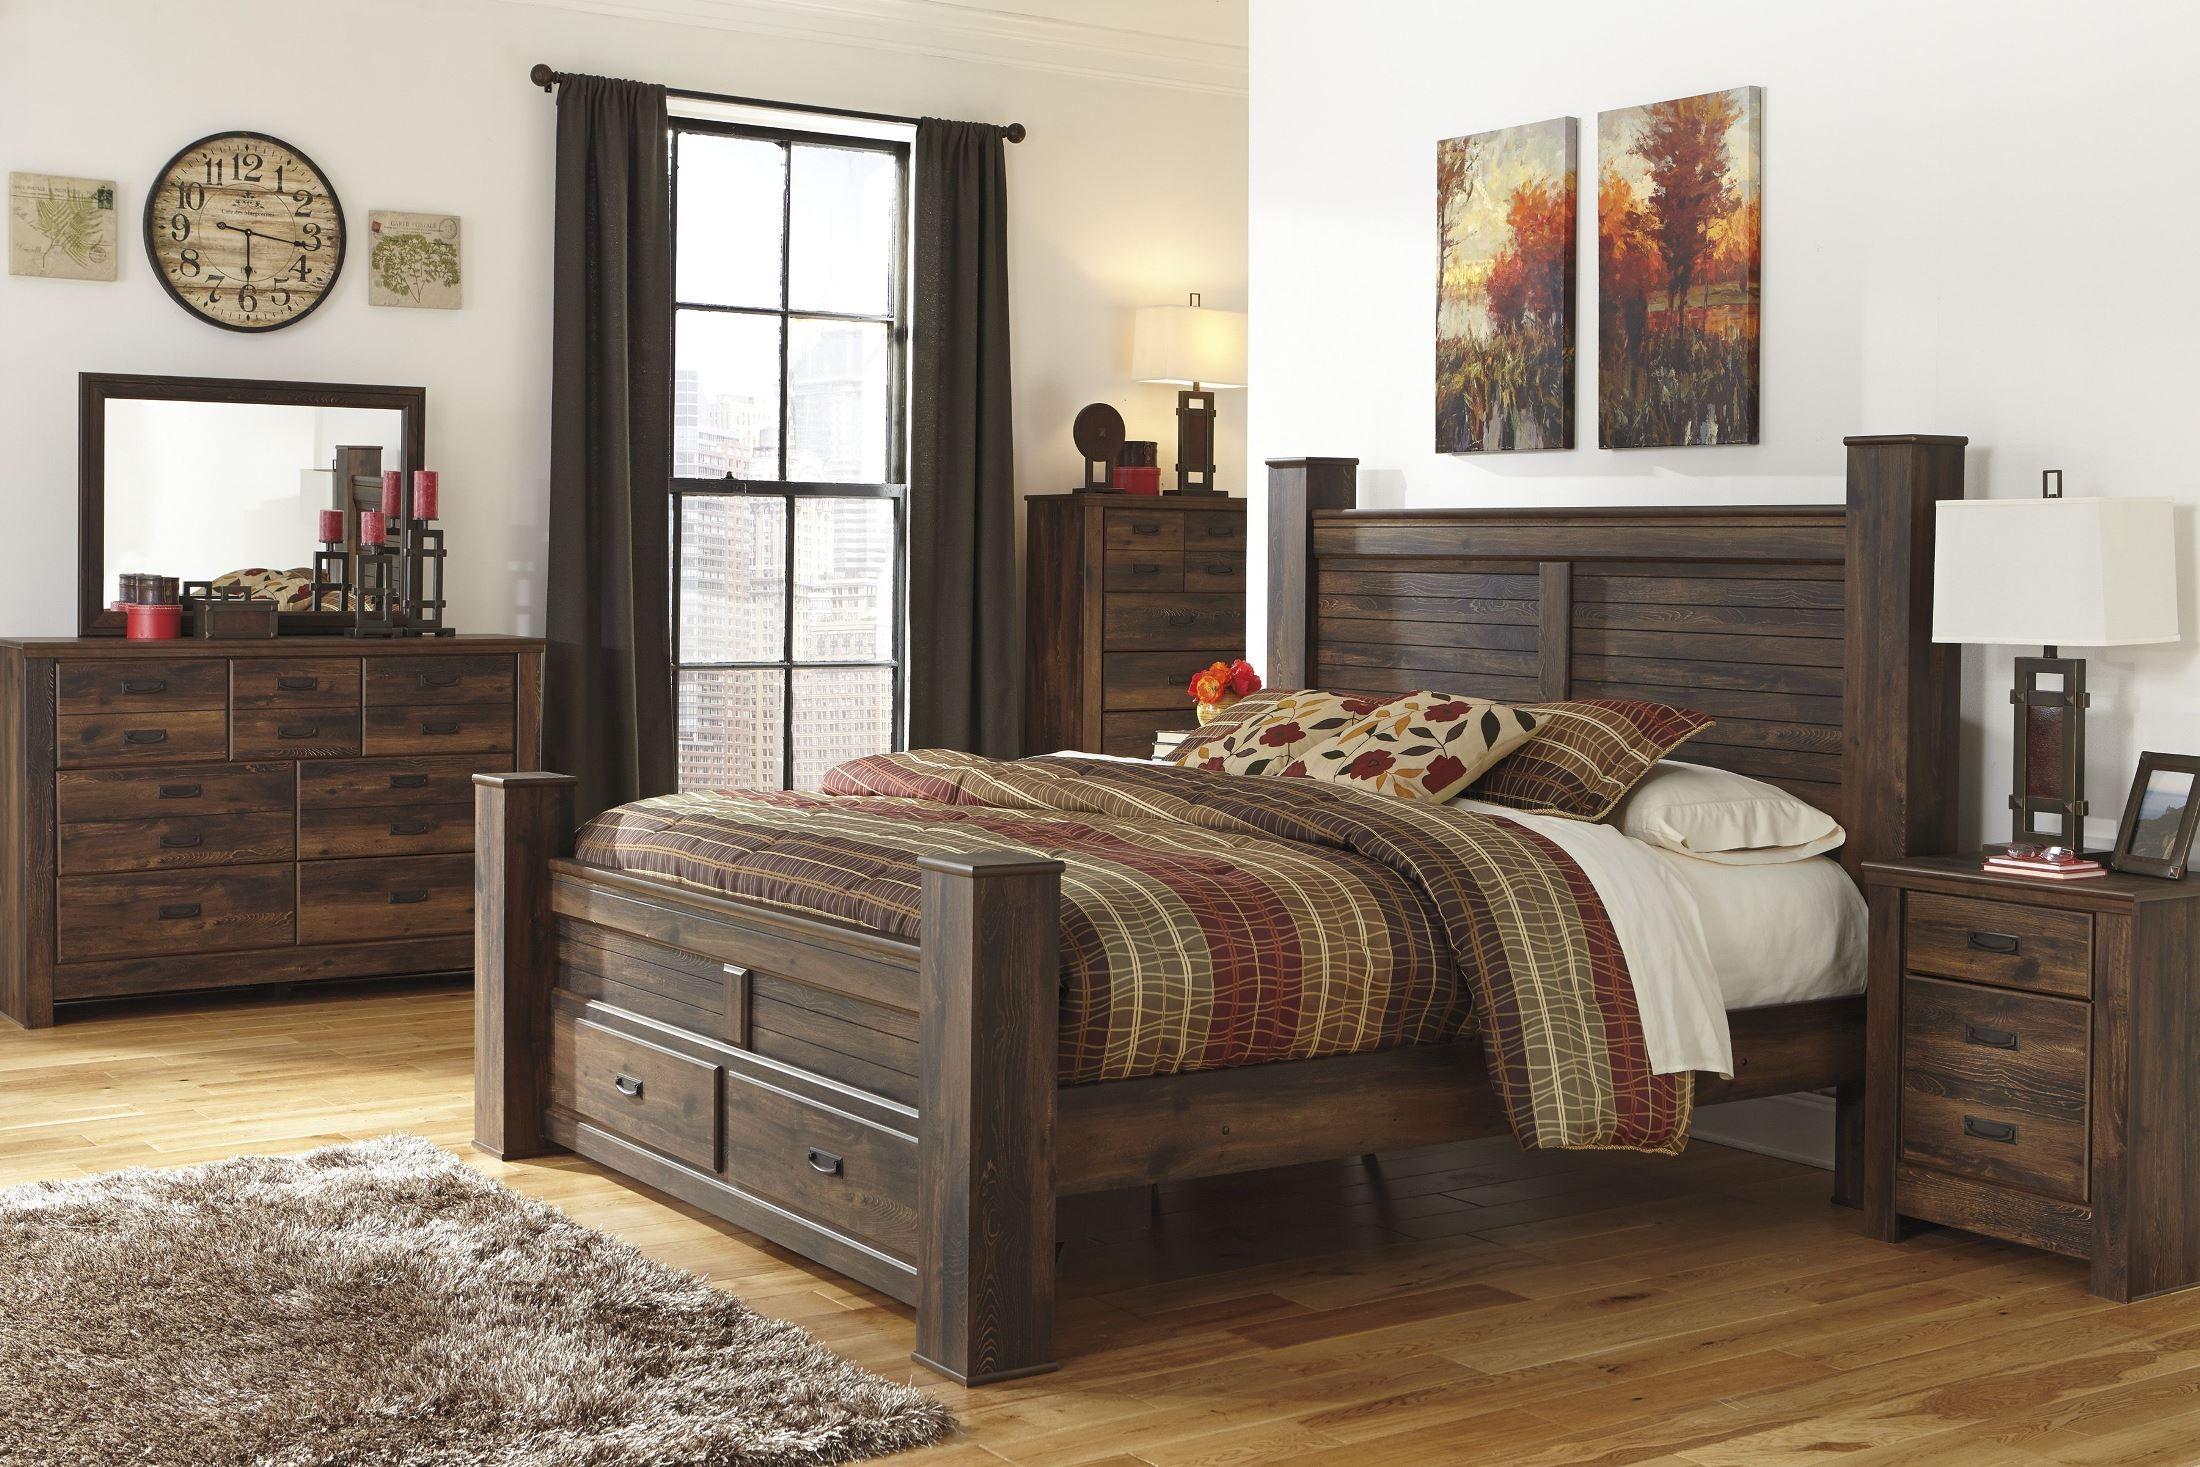 Quinden Dresser From Ashley B246 31 Coleman Furniture